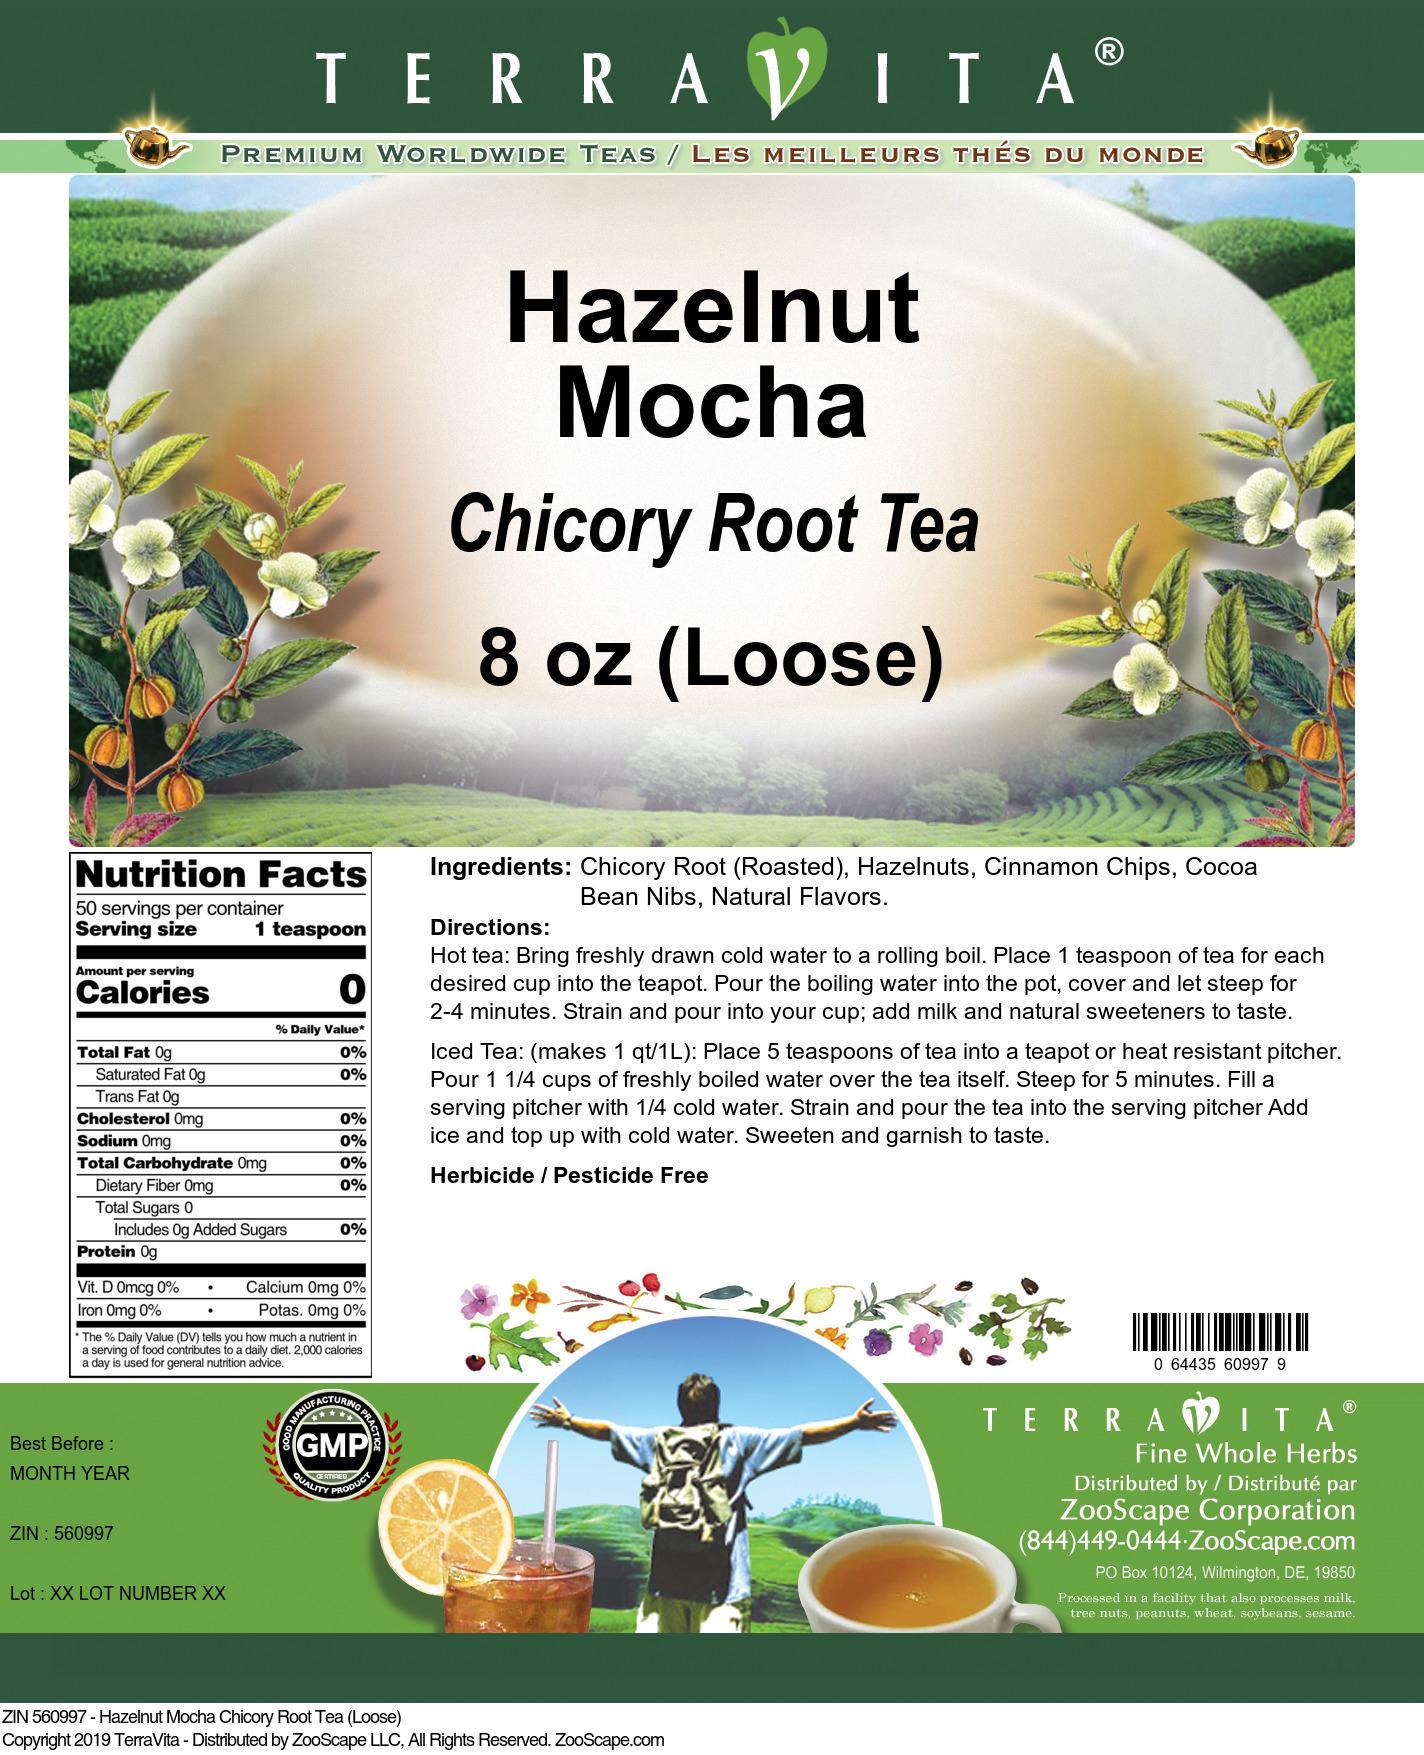 Hazelnut Mocha Chicory Root